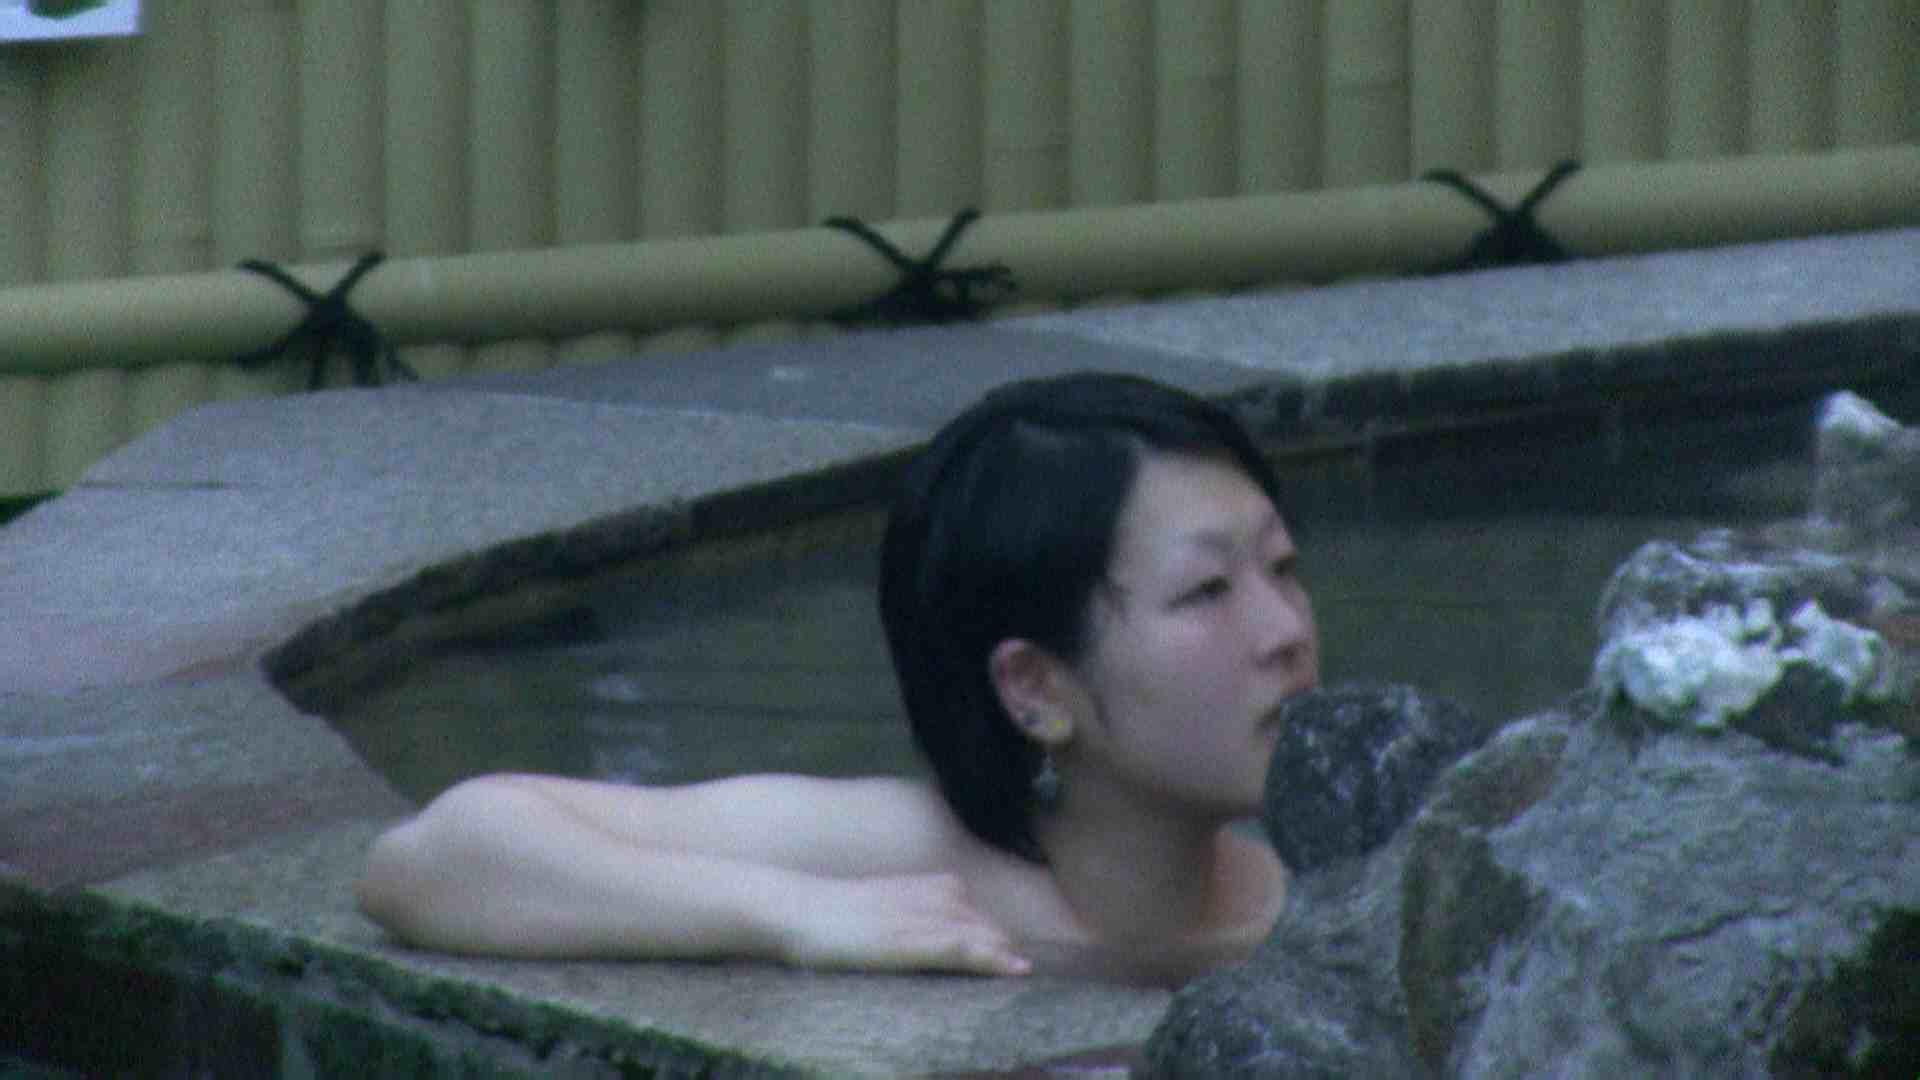 Aquaな露天風呂Vol.05【VIP】 露天風呂編  112PIX 94